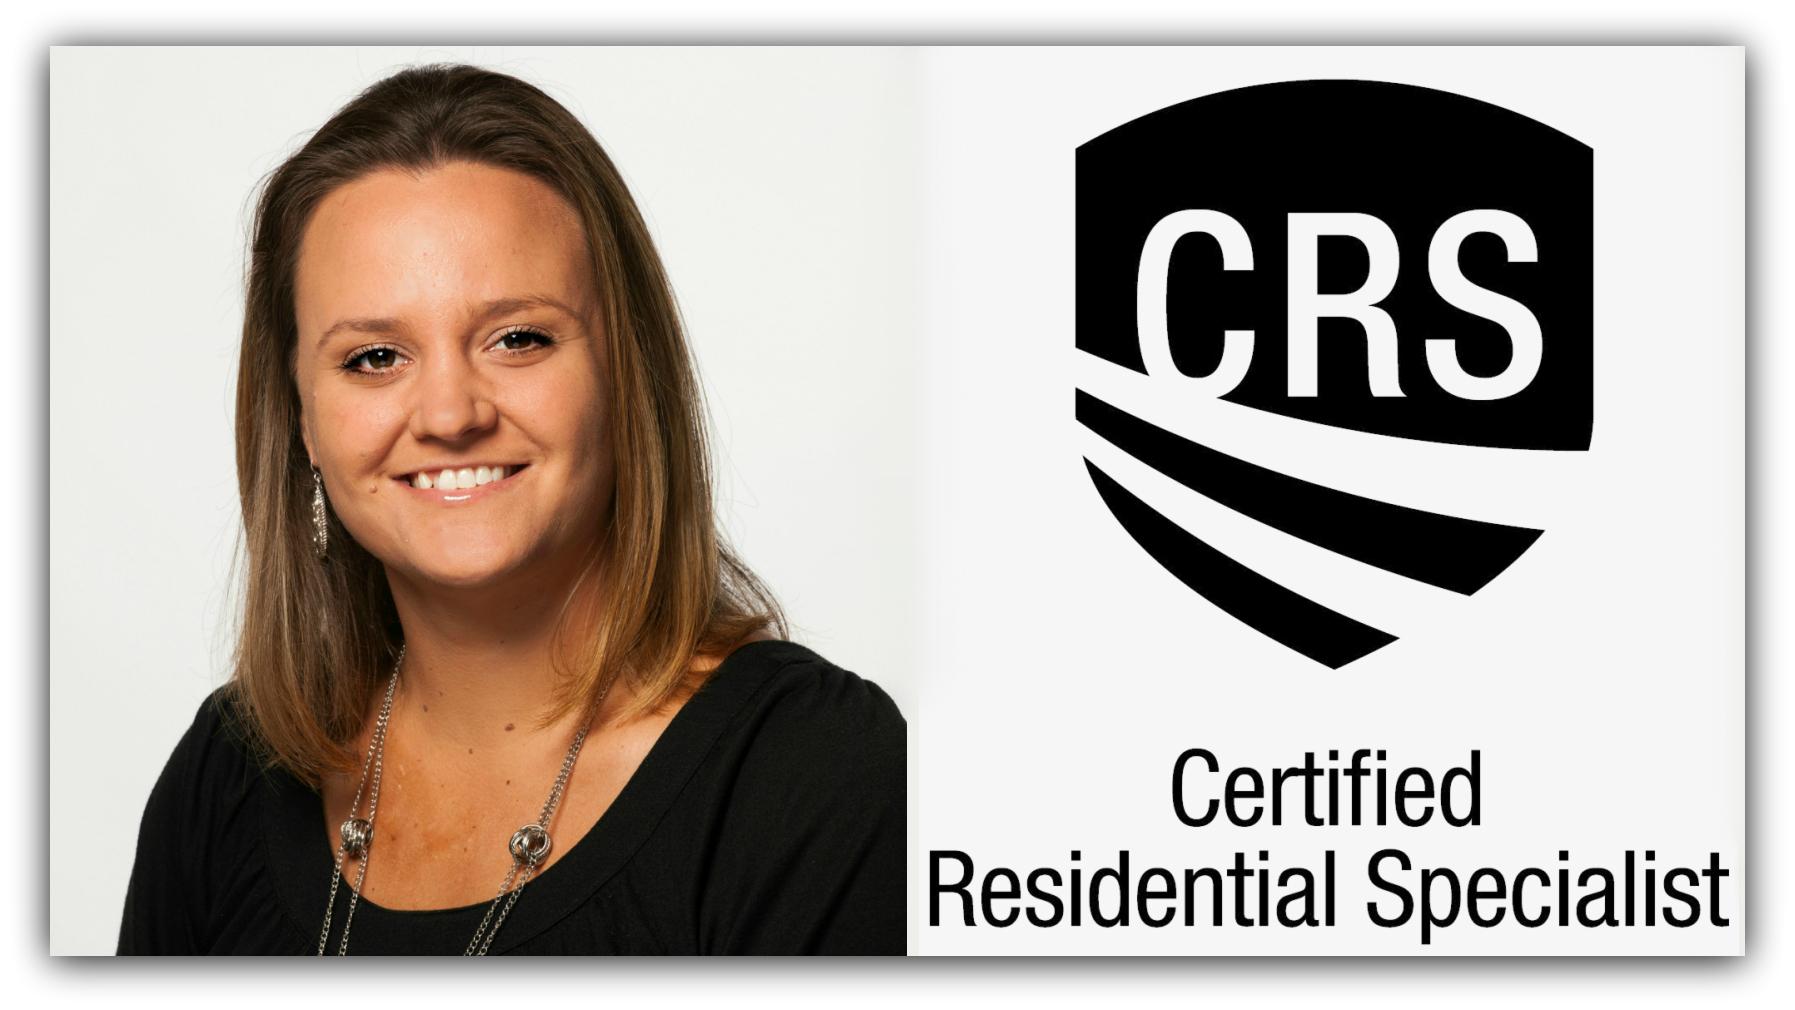 Jennifer Elkins Has Been Awarded the CRS Designation title